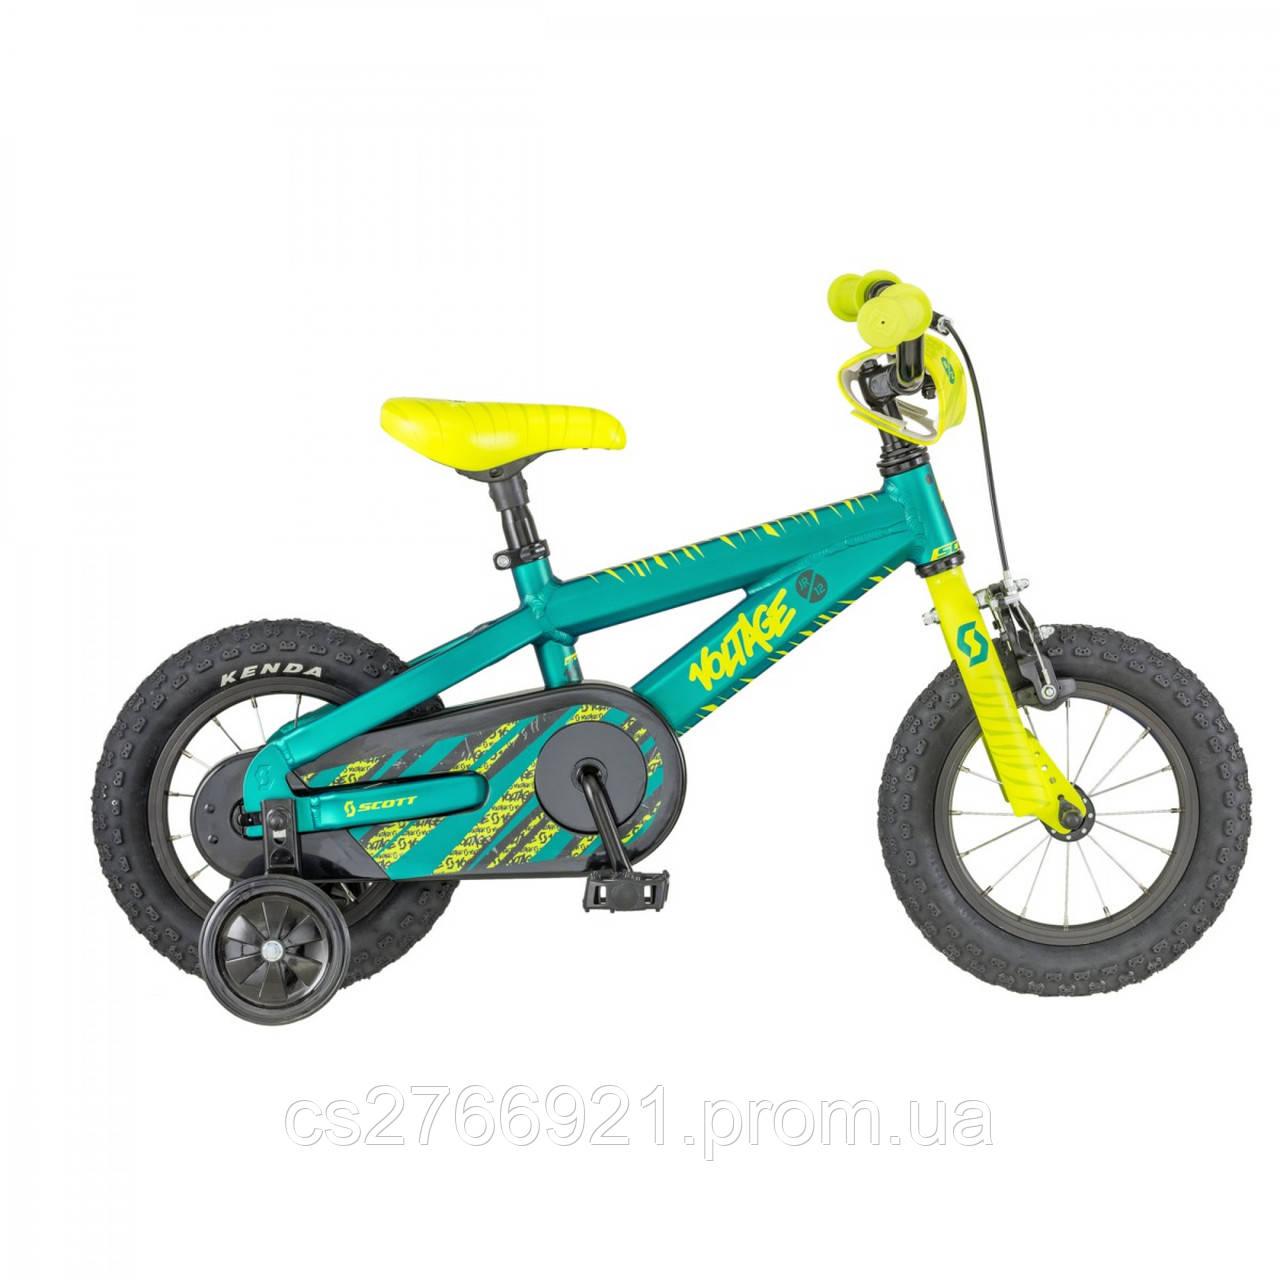 Велосипед VOLTAGE JR 12 18 SCOTT